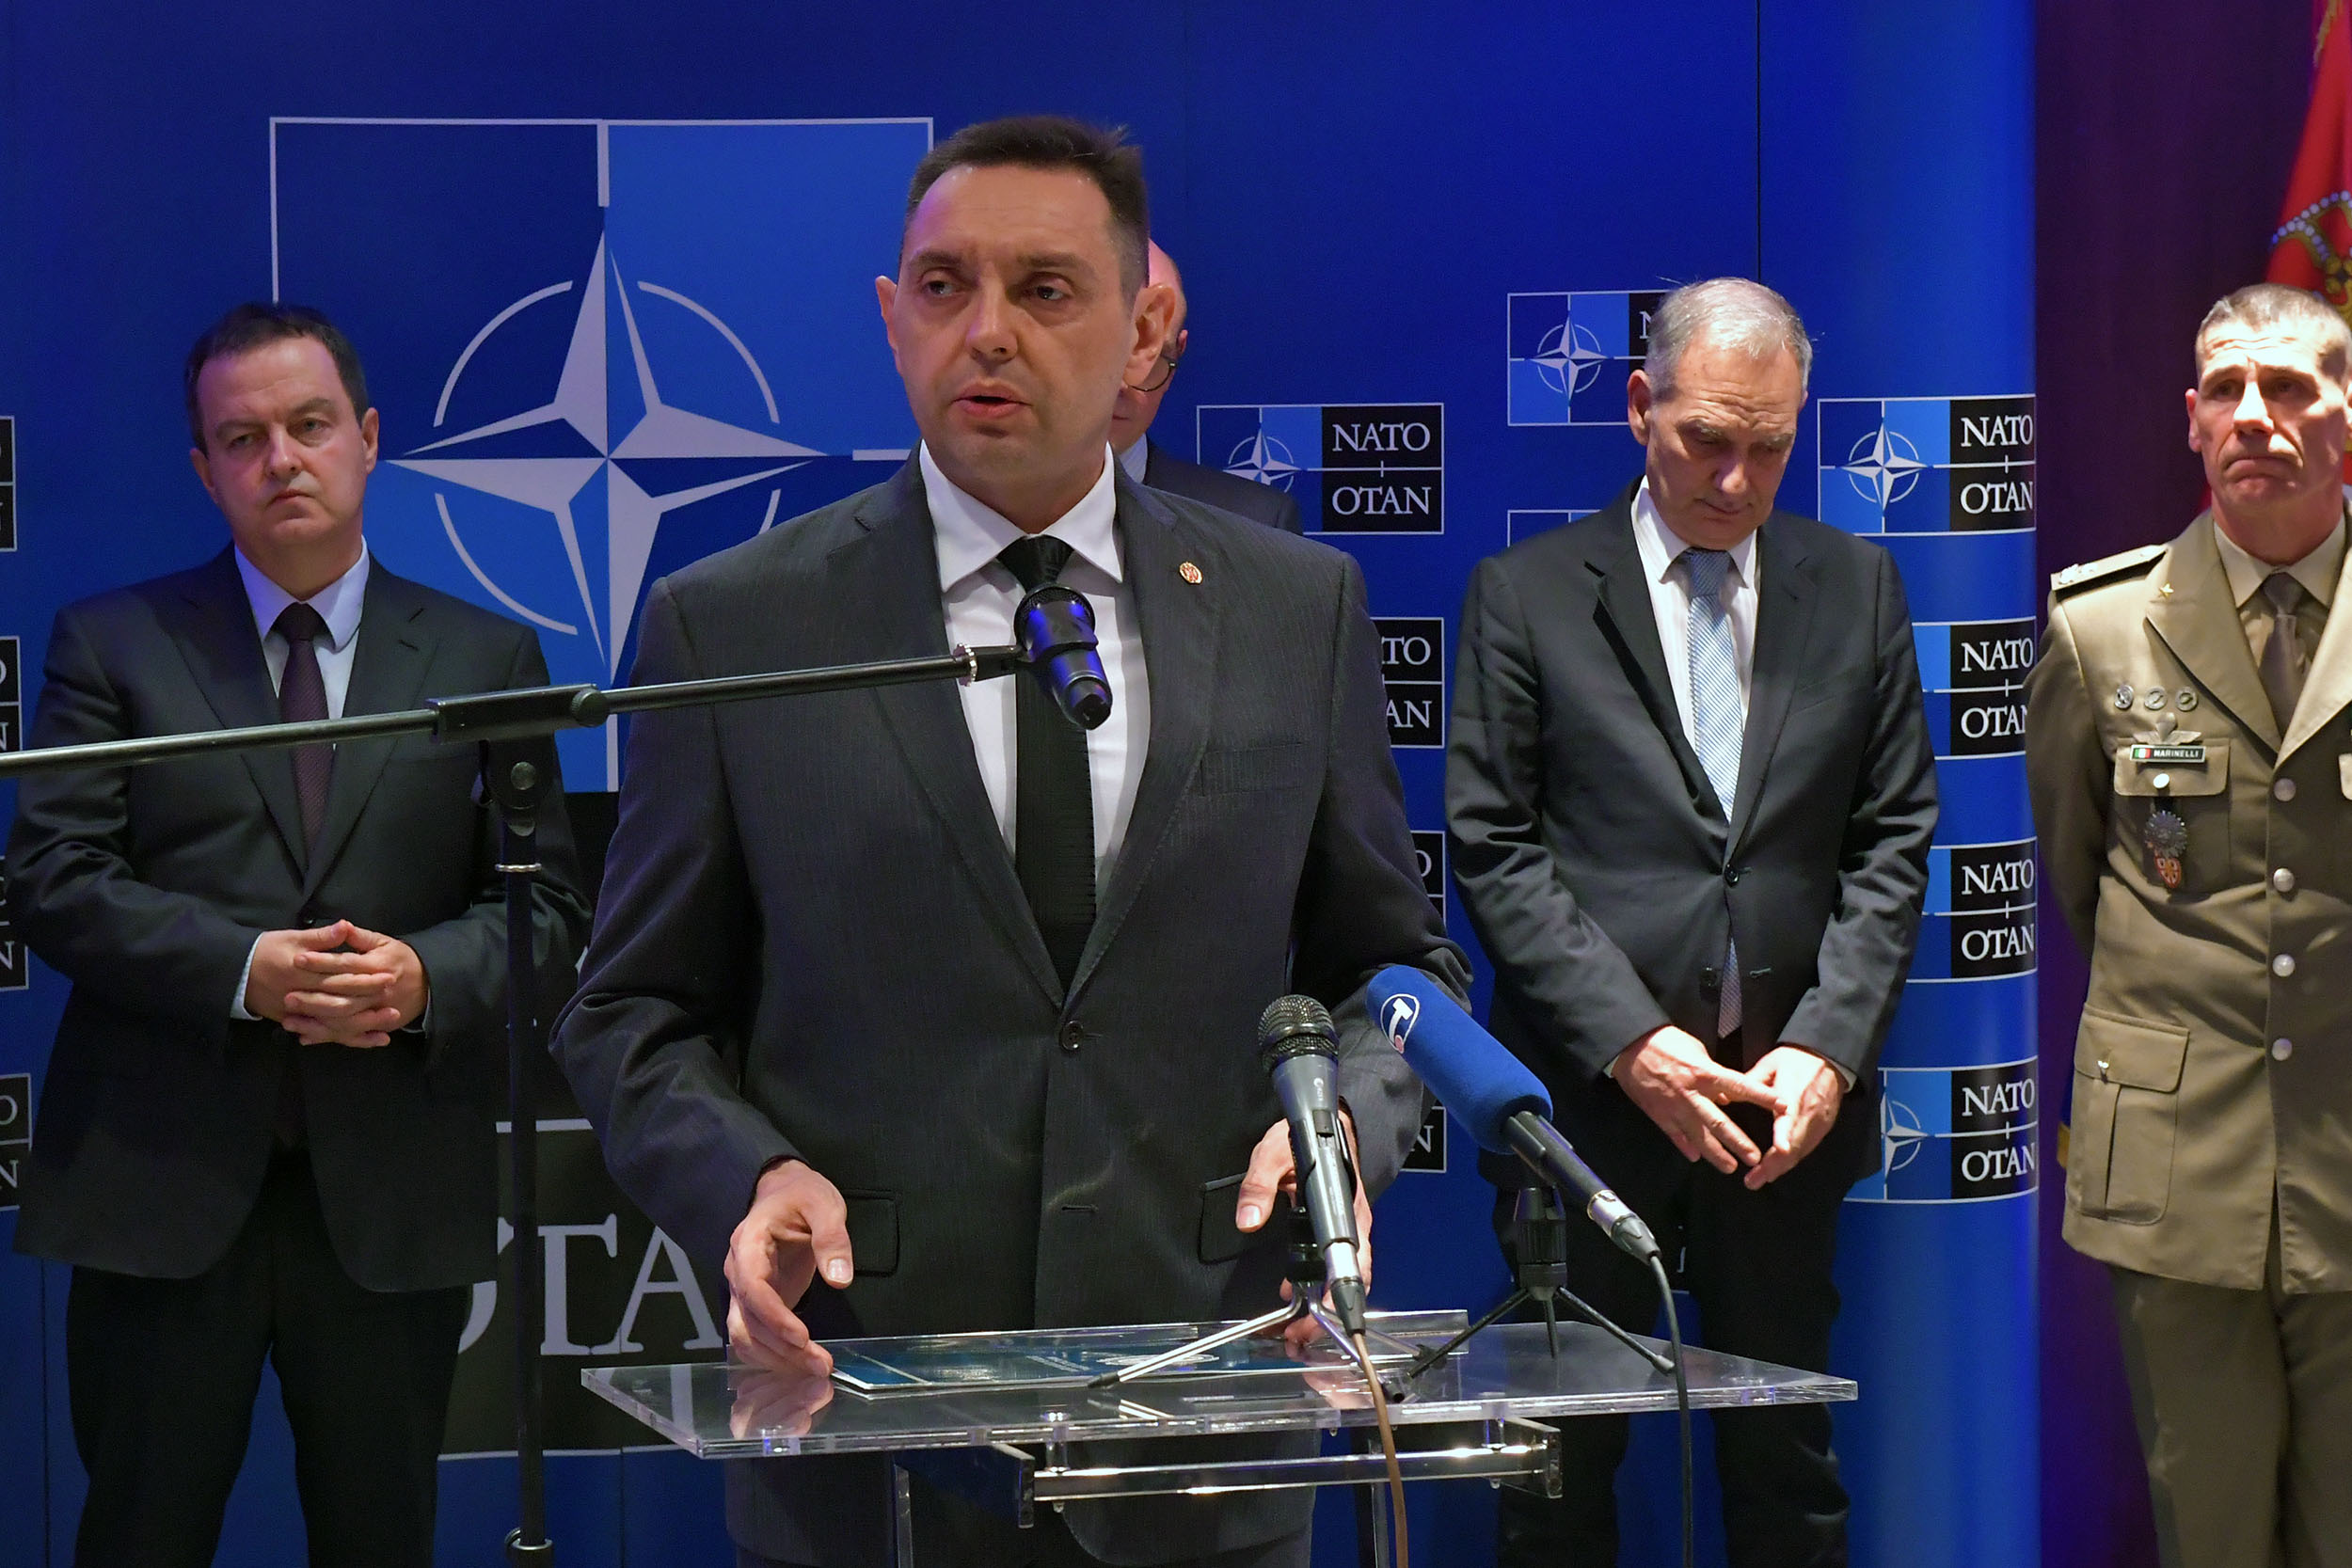 НАТО агресија на СРЈ последњи велики злочин 20. века